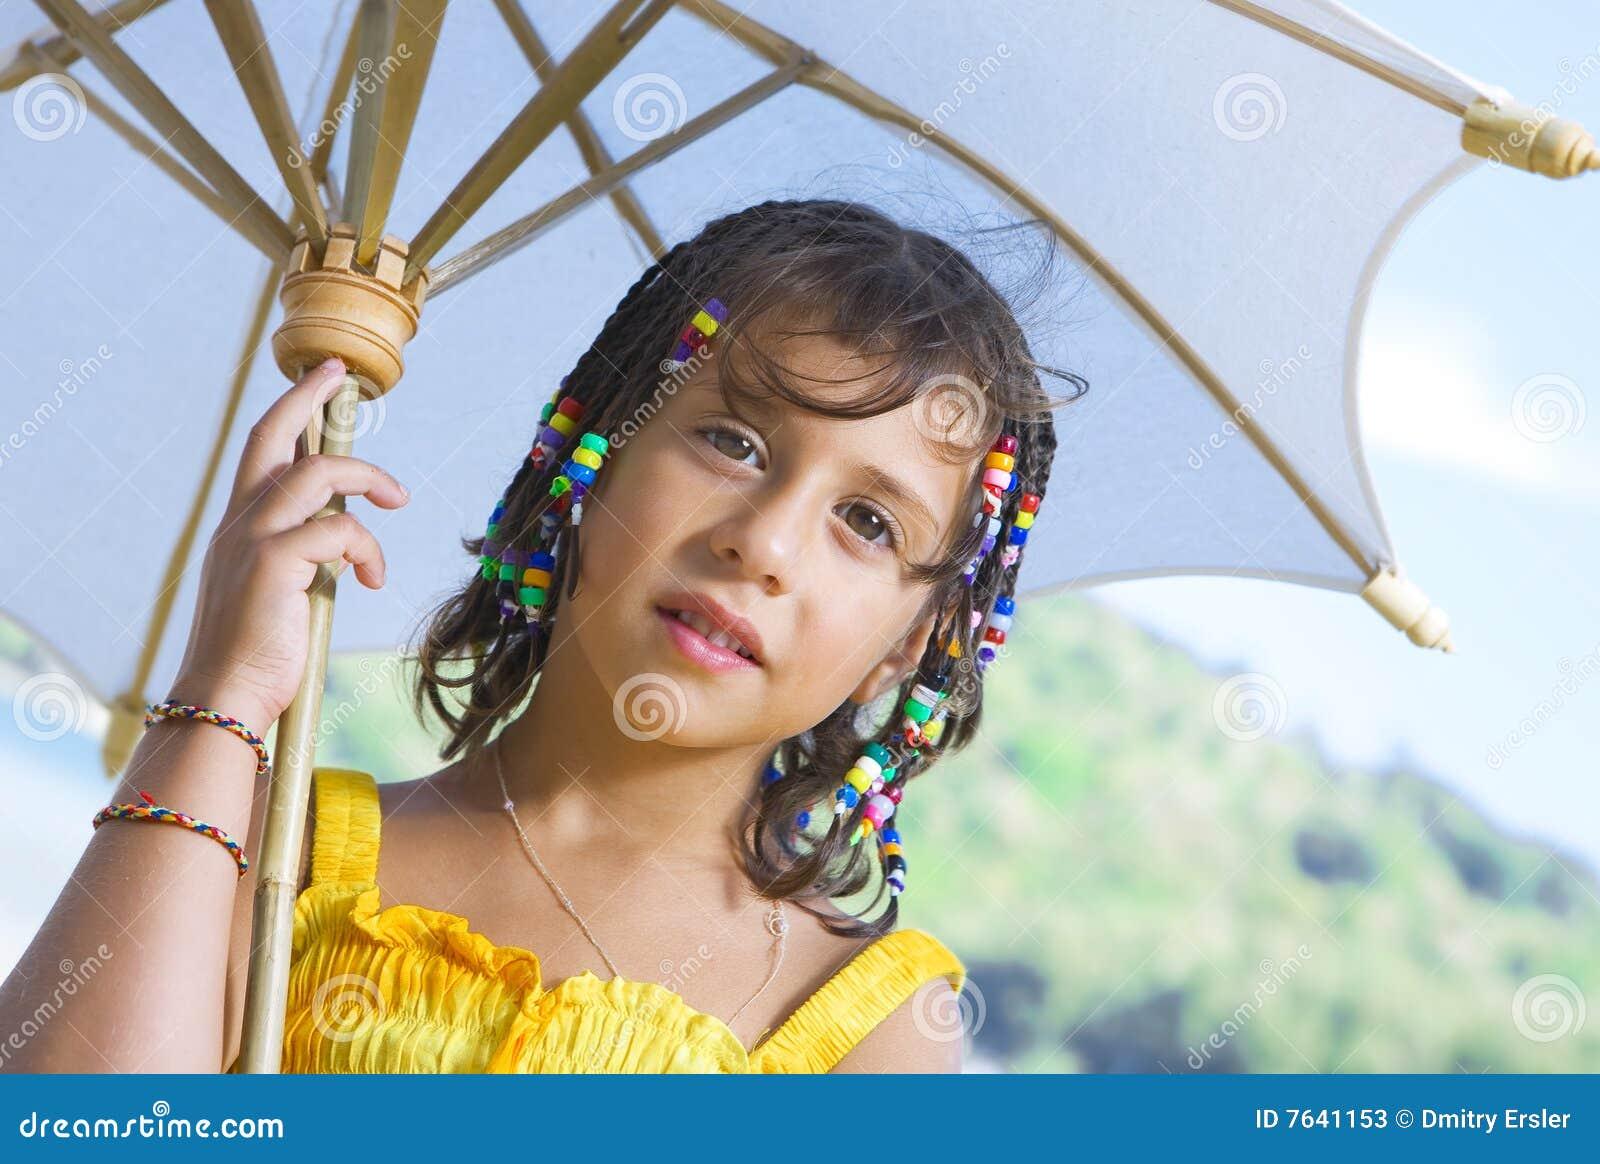 Com guarda-chuva